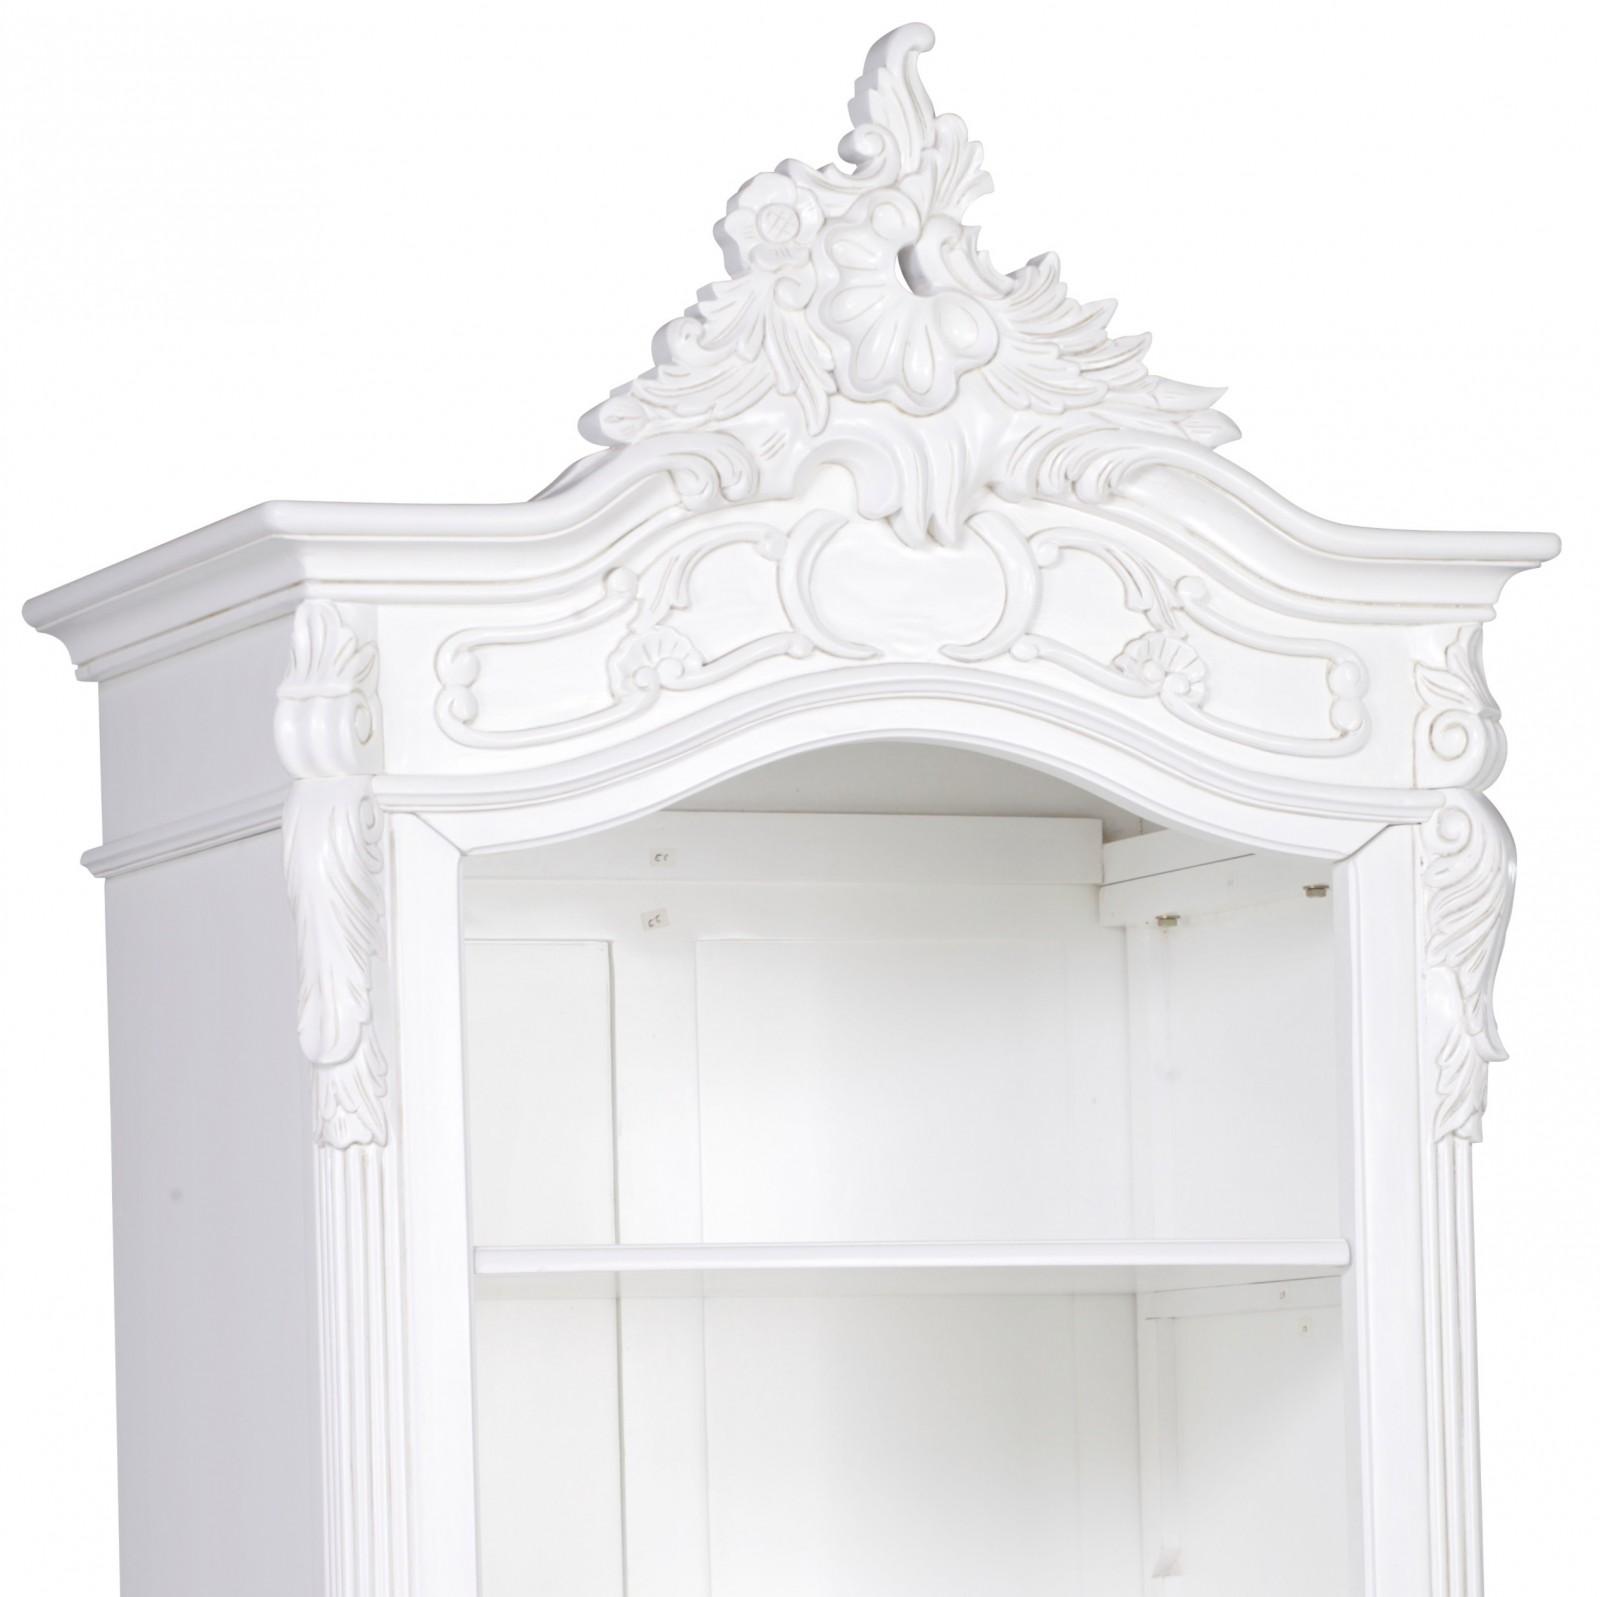 Annette French Style White Rococo Carved Open Bookcase Furniture La Maison Chic Luxury Interiors